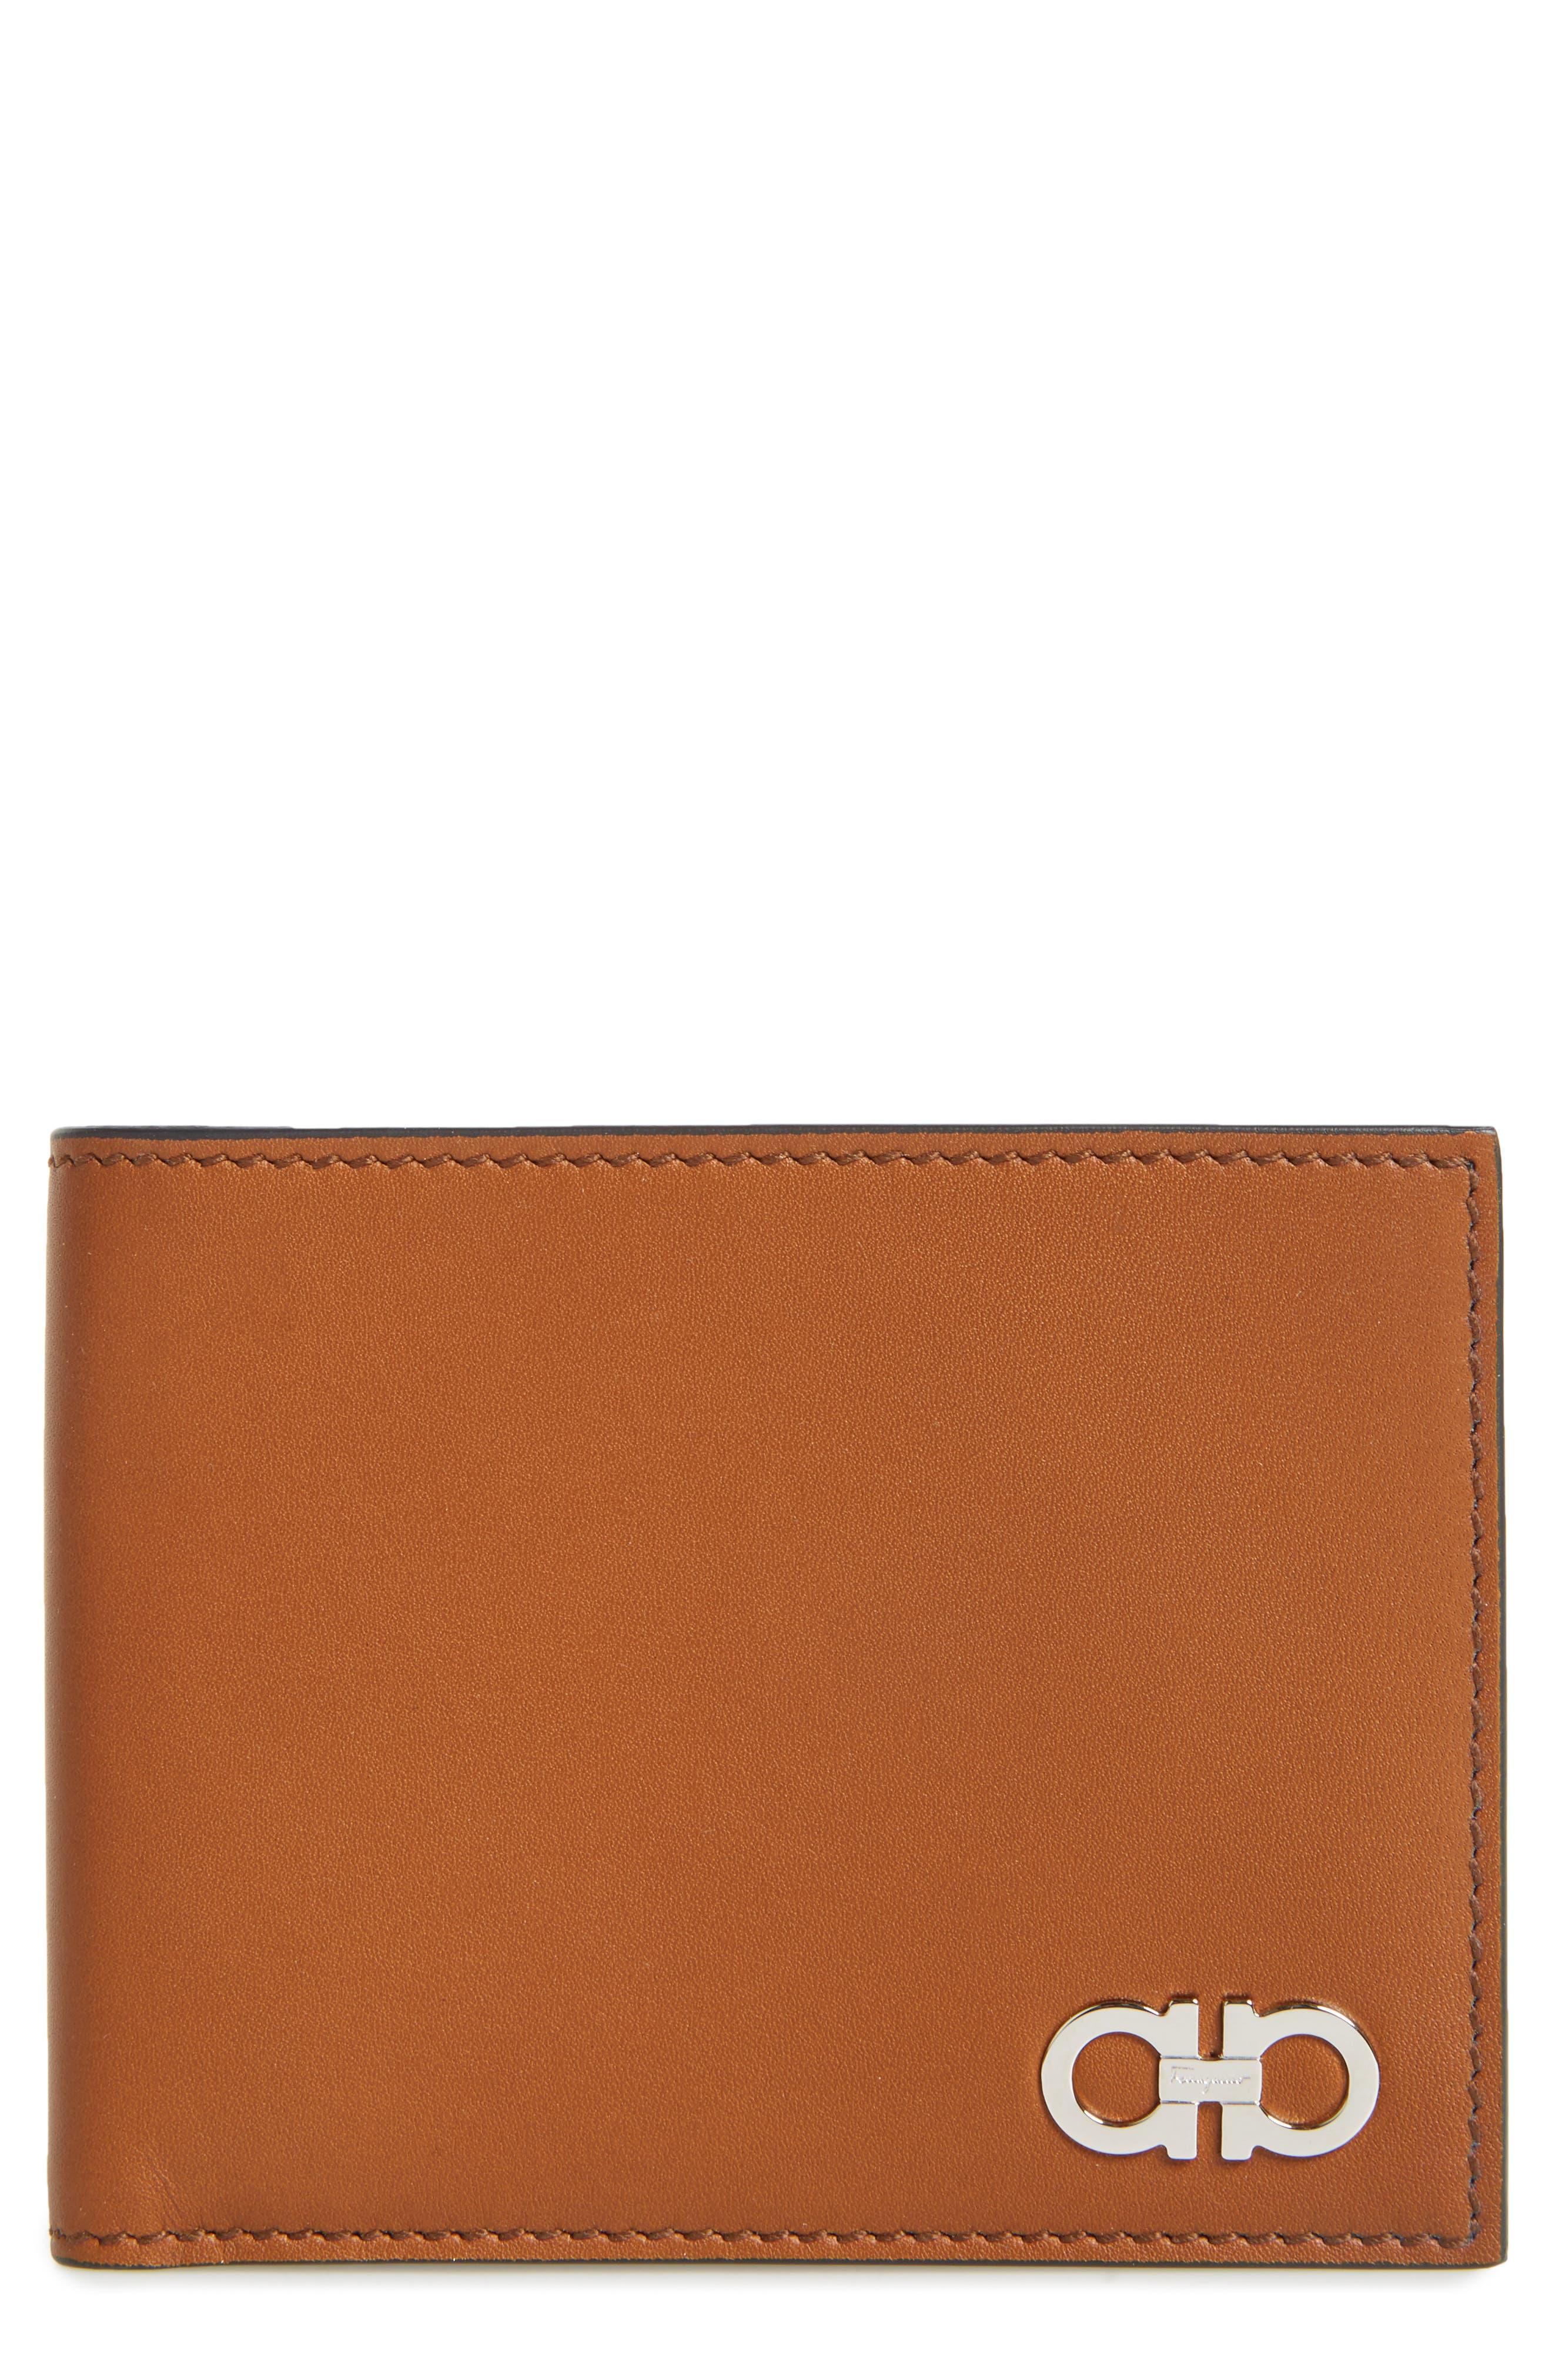 Calfskin Leather Bifold Wallet,                         Main,                         color, Radica